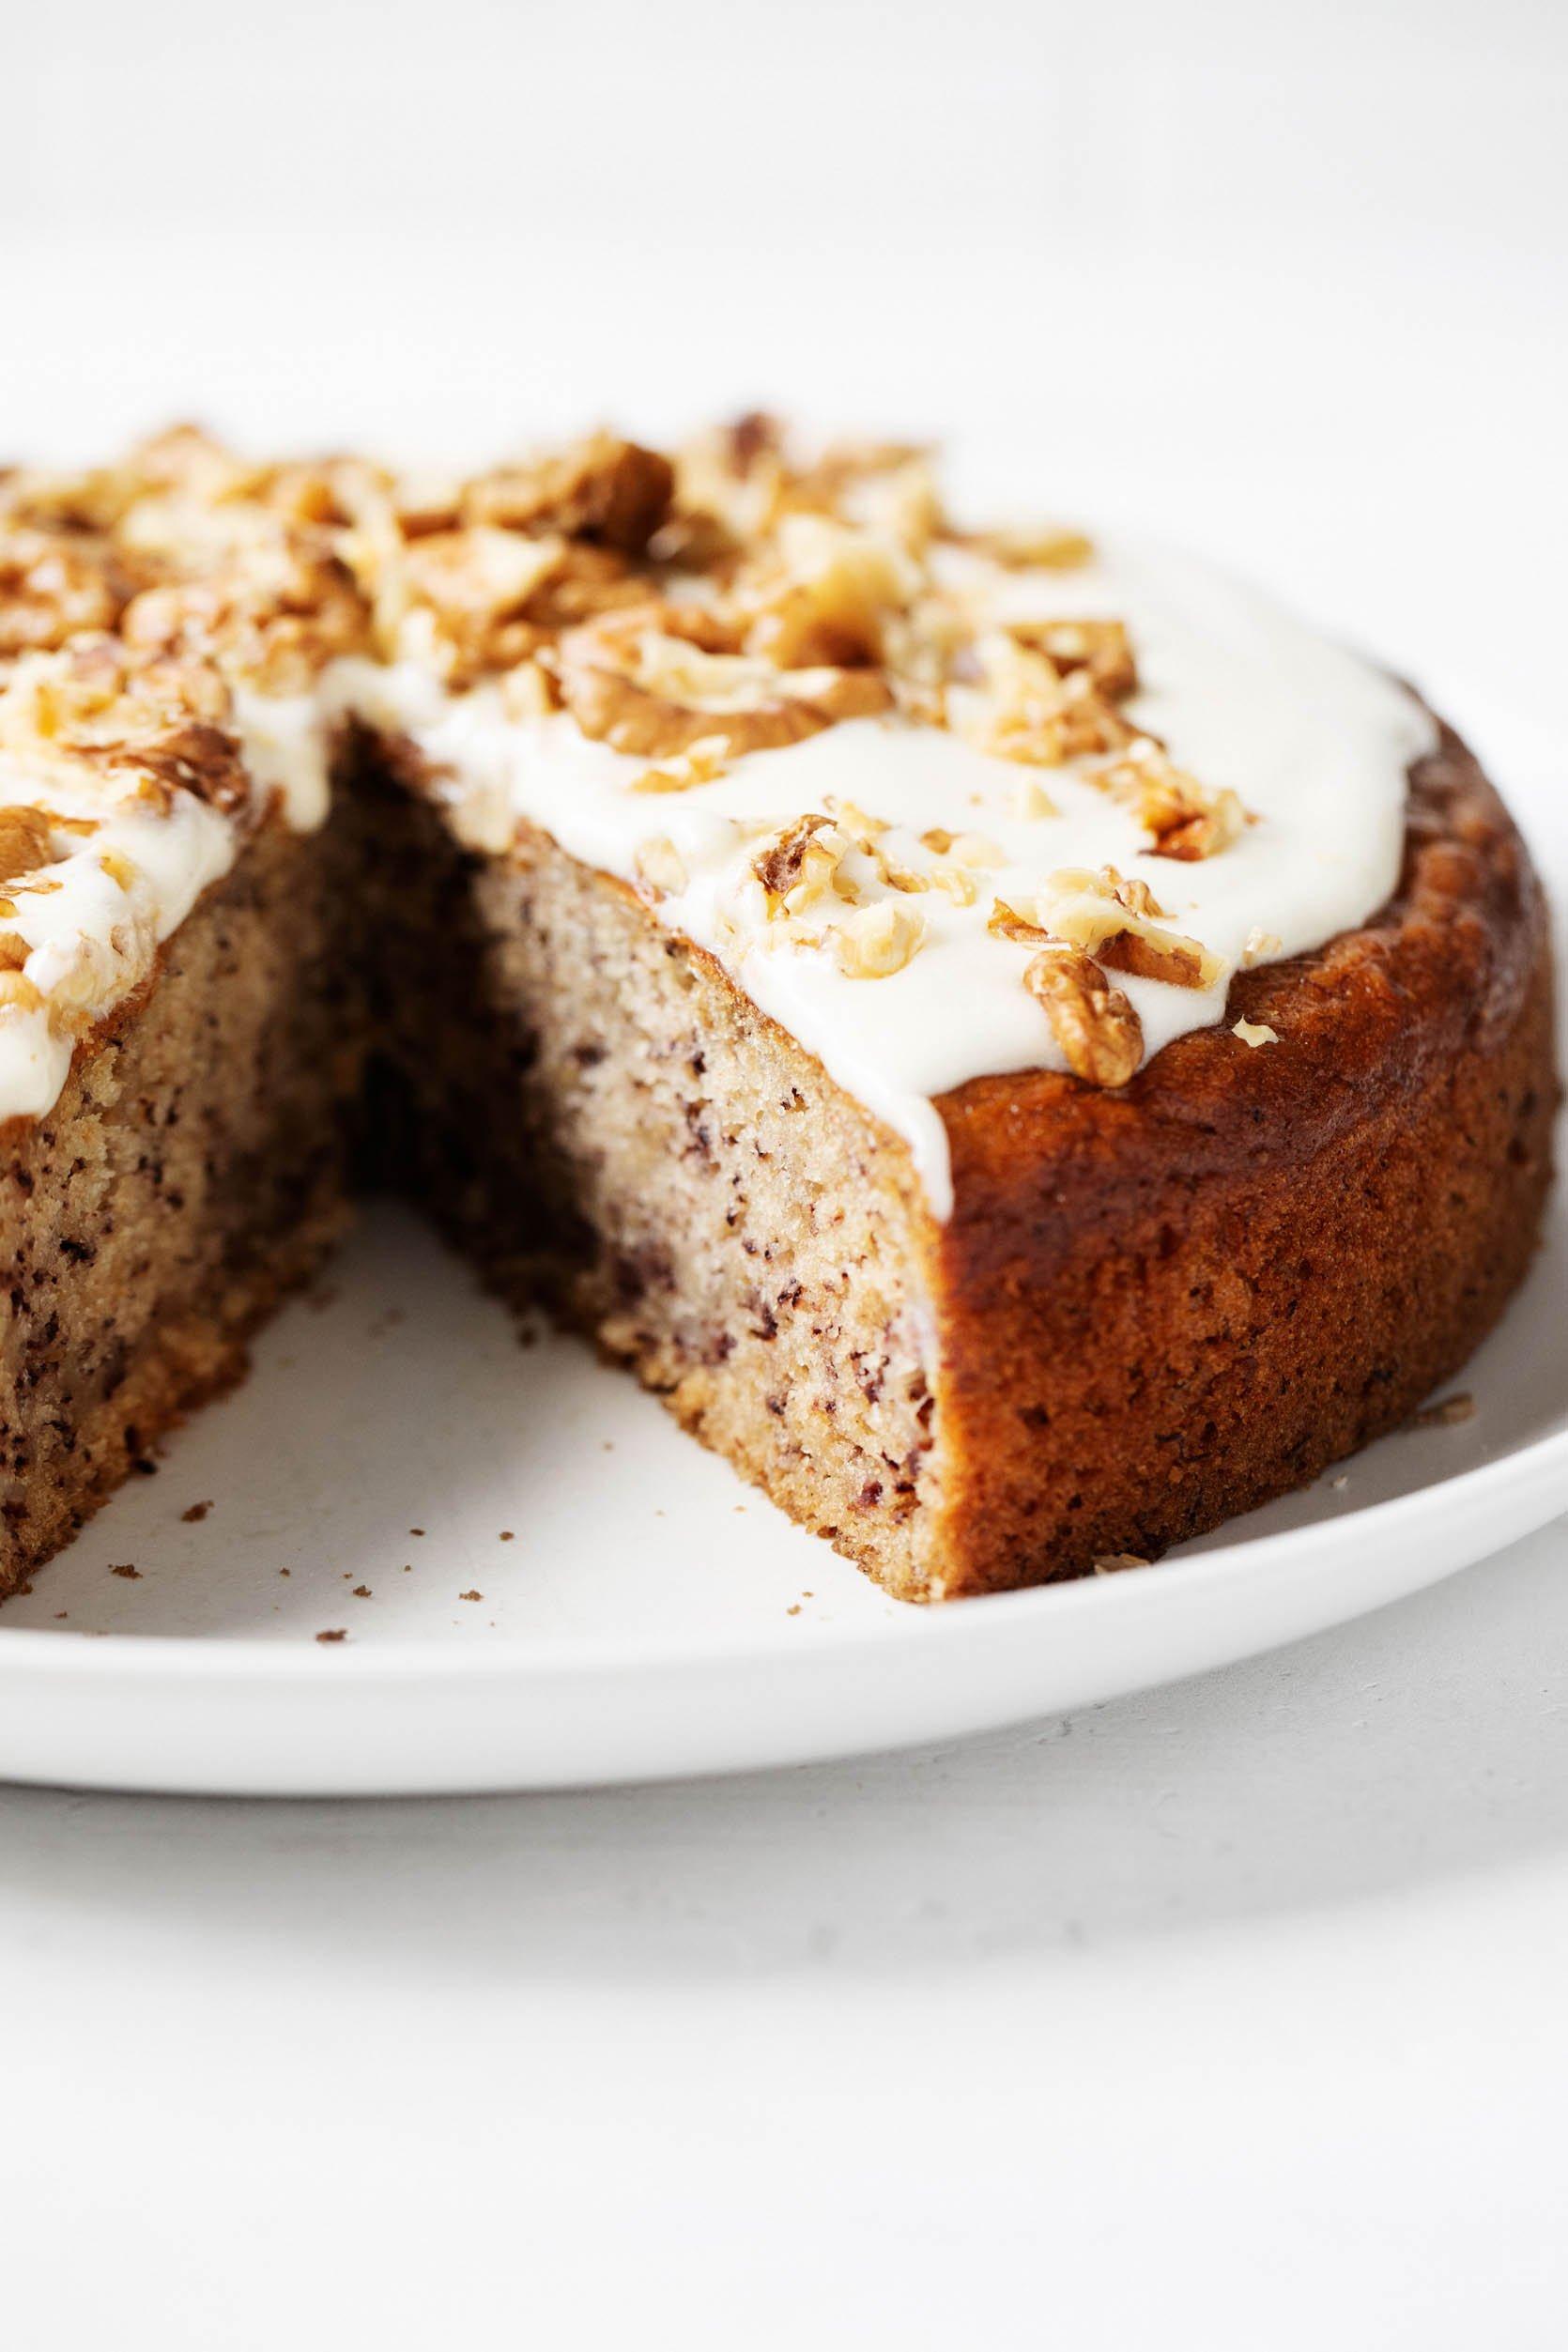 Vegan Banana Cake With Cashew Frosting A Nostalgic Cozy Treat